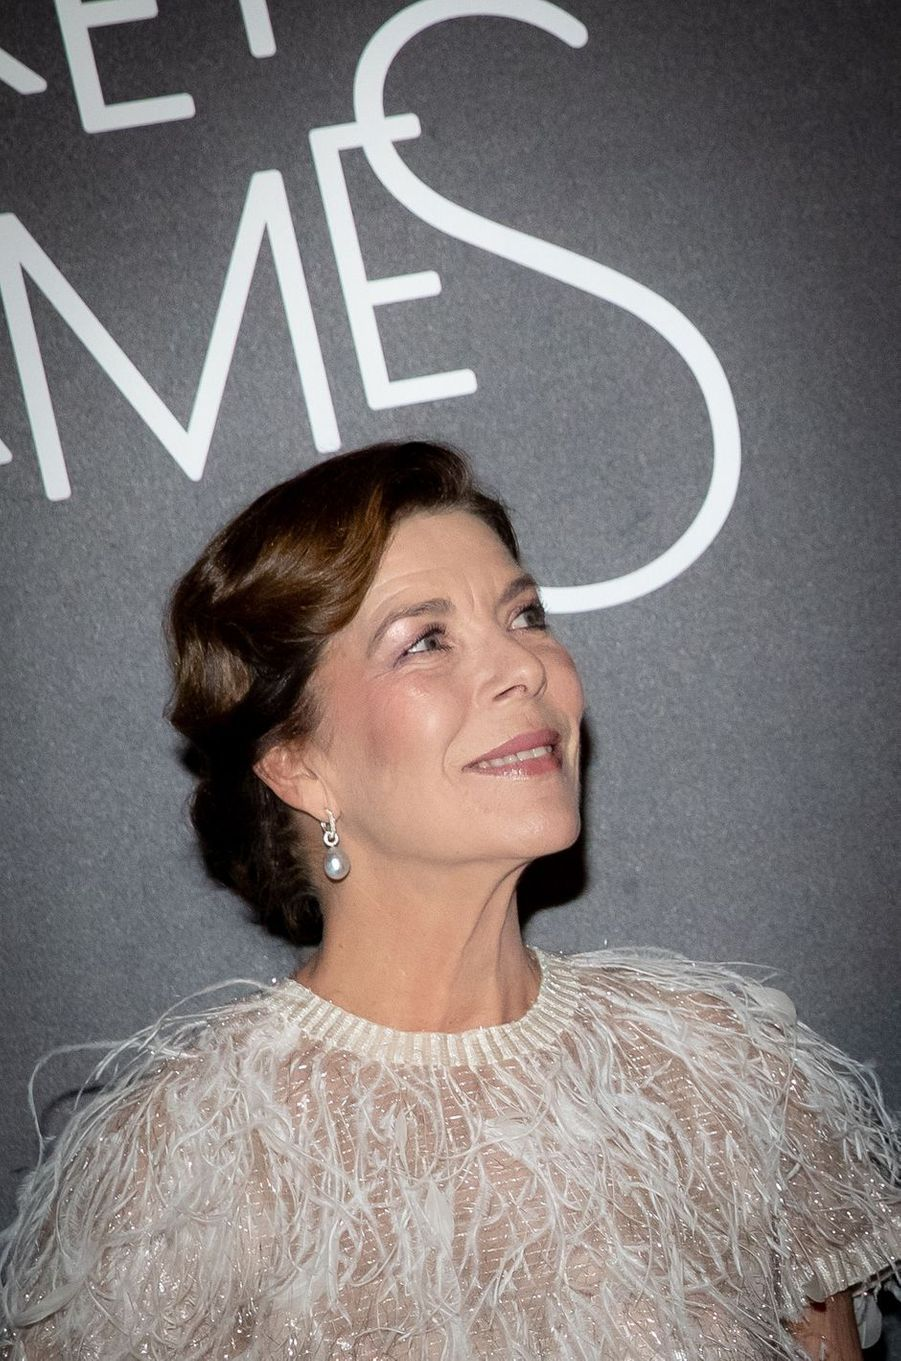 La princesse Caroline de Monaco à Monaco, le 5 octobre 2019